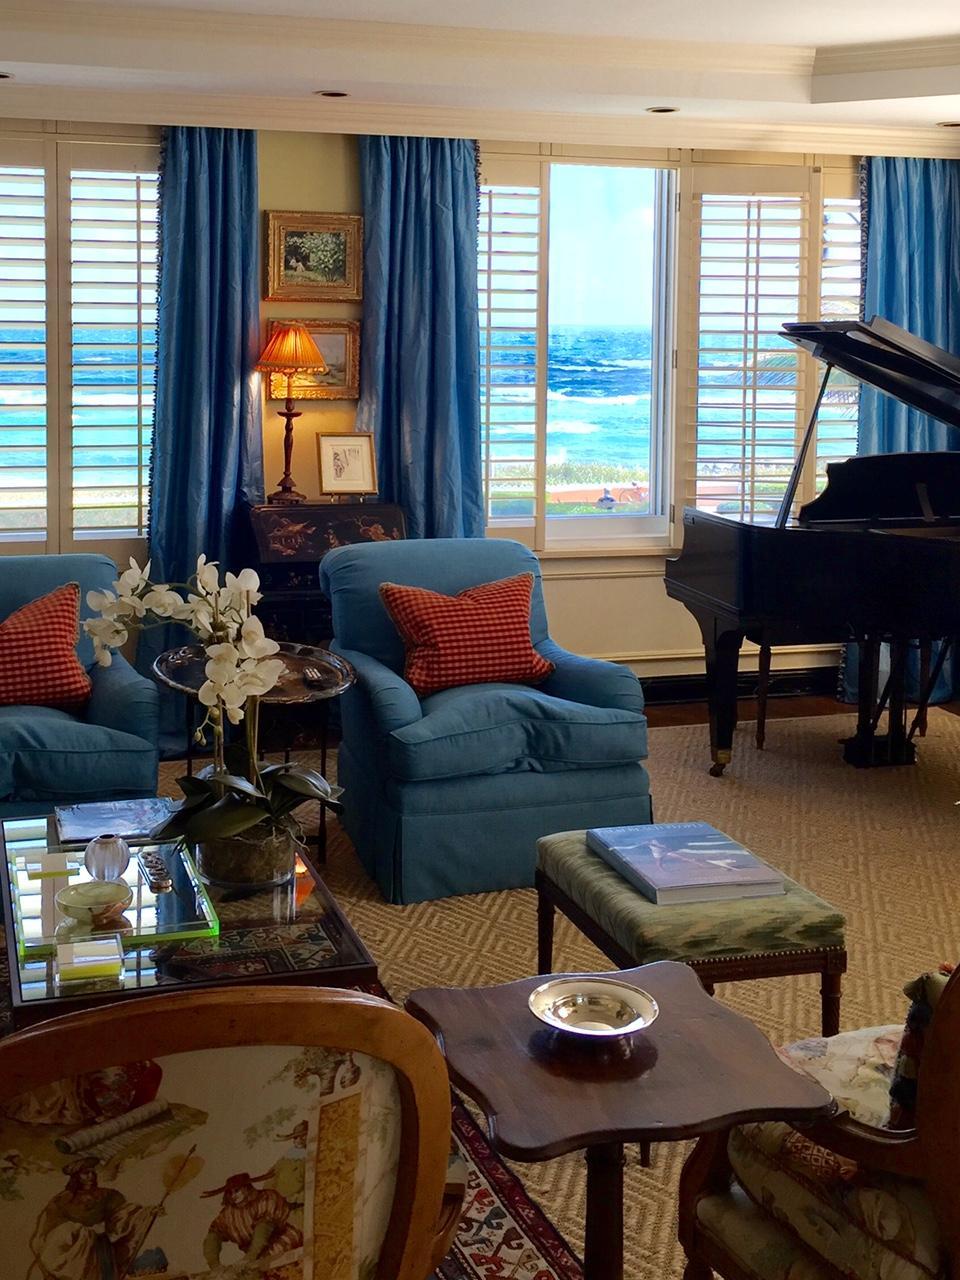 340 Ocean Boulevard, Palm Beach, Florida 33480, 3 Bedrooms Bedrooms, ,2.1 BathroomsBathrooms,Condo/Coop,For Rent,Ocean,2,RX-10442638